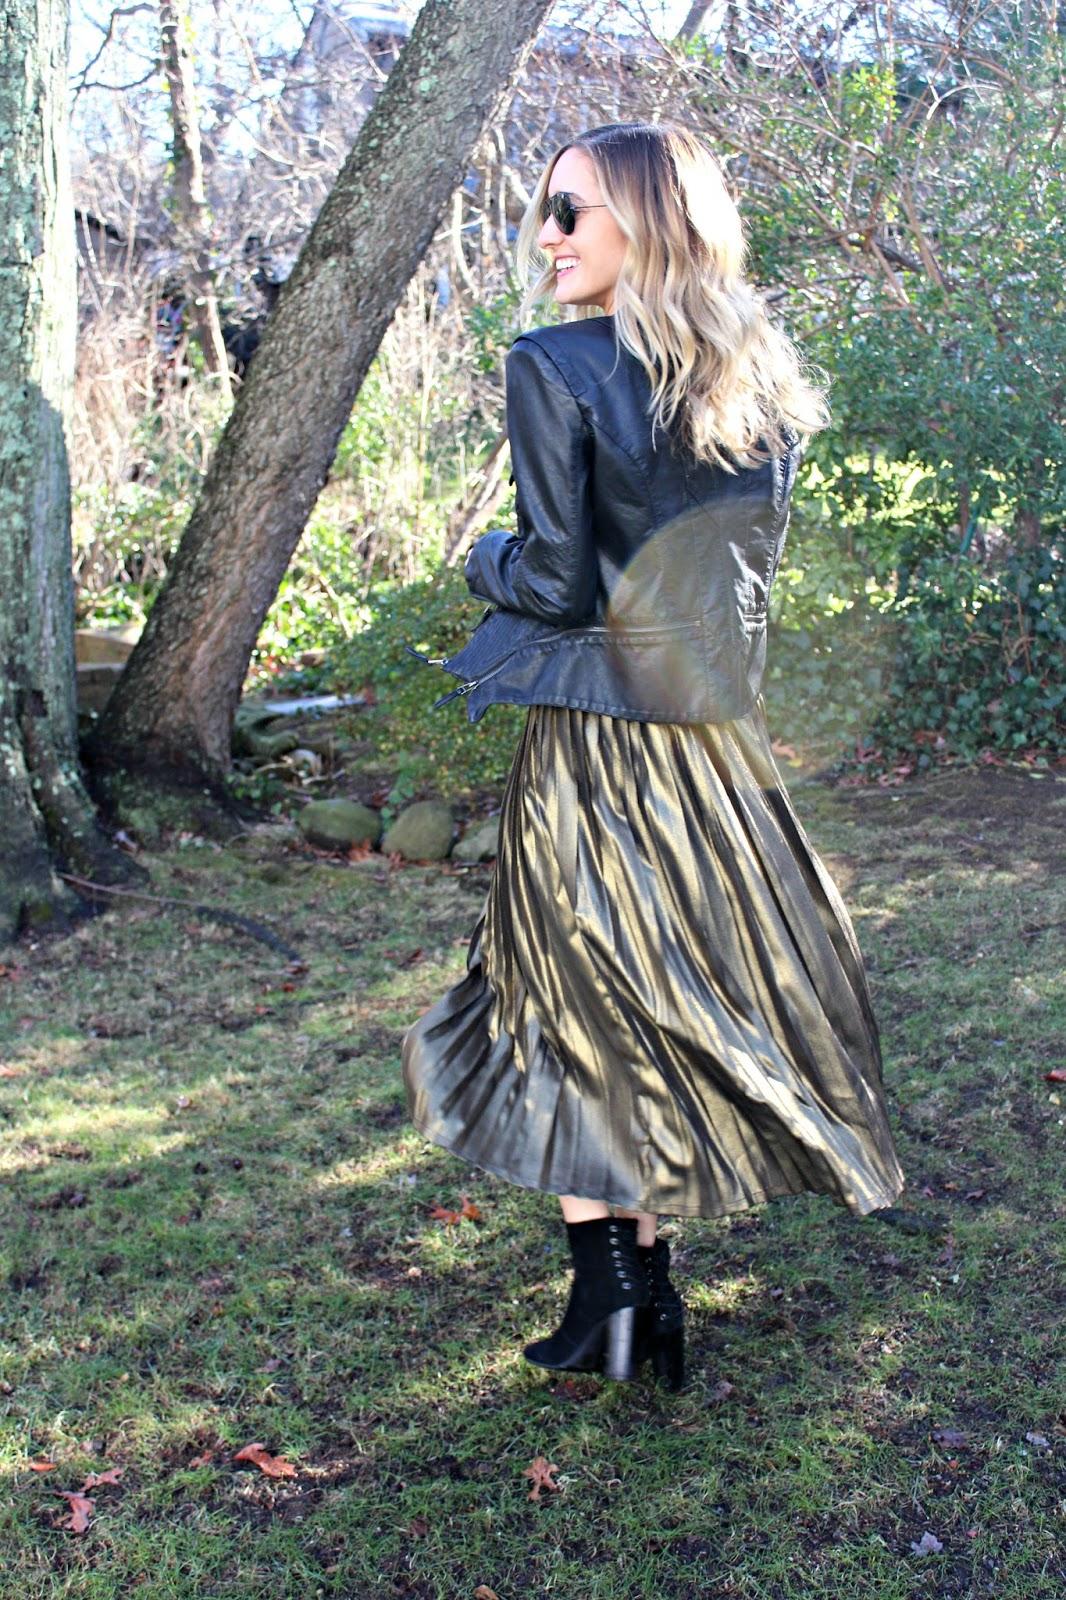 http://www.zaful.com/high-waisted-pleated-midi-skirt-p_218157.html?lkid=14189